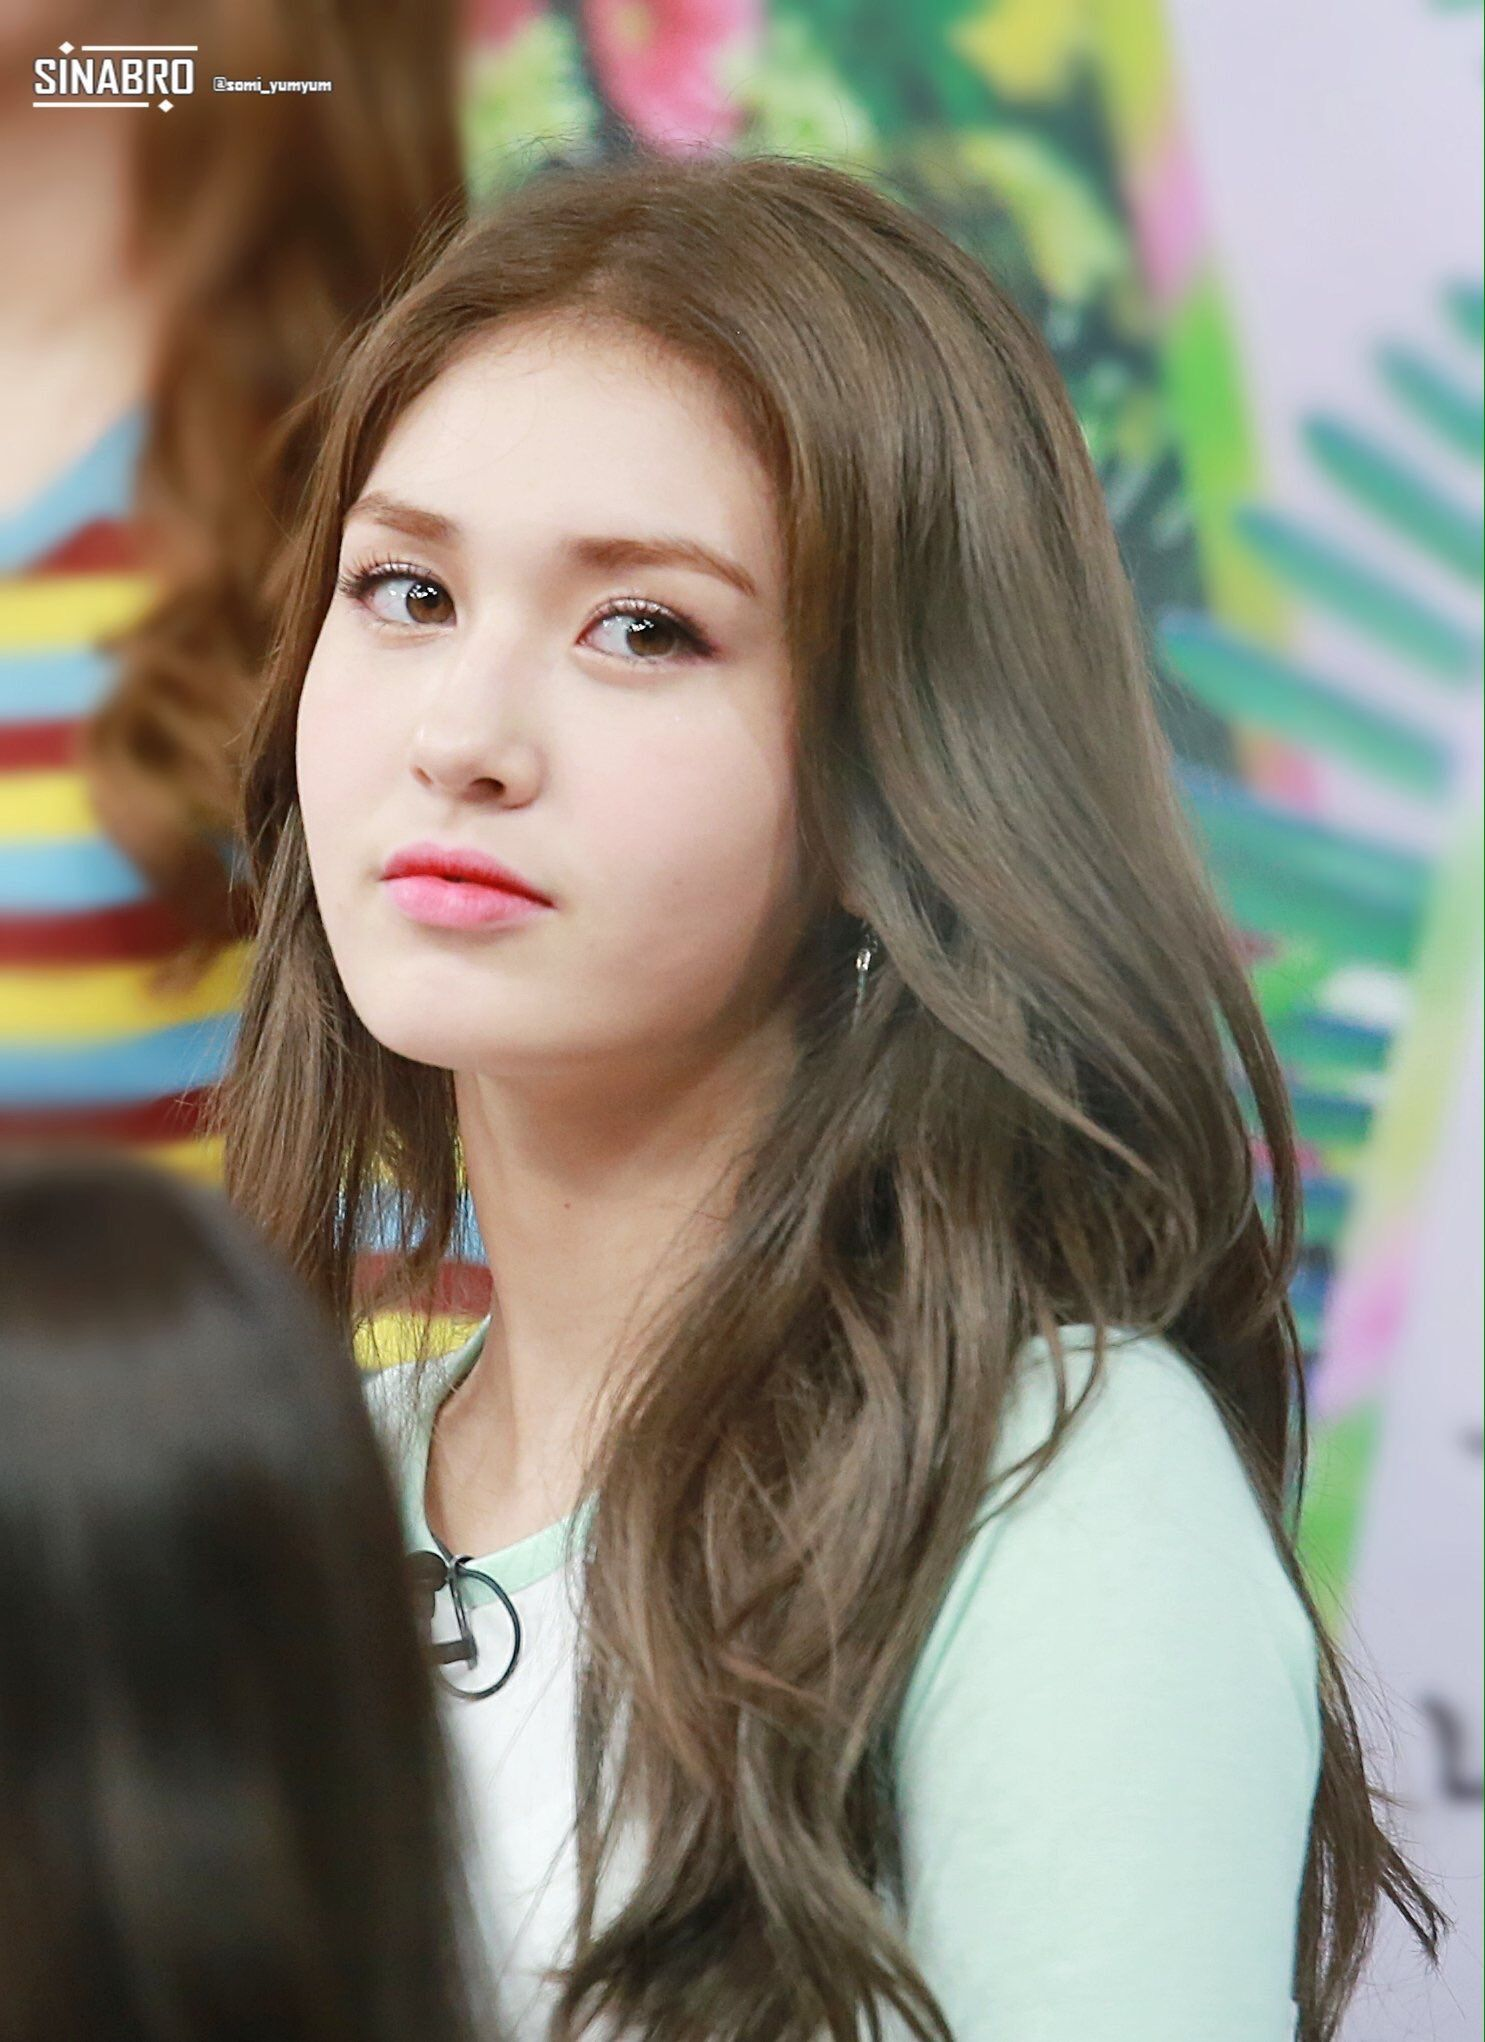 Jeon Somi 전소미 Jeon Somi Pinterest Kpop Korean And